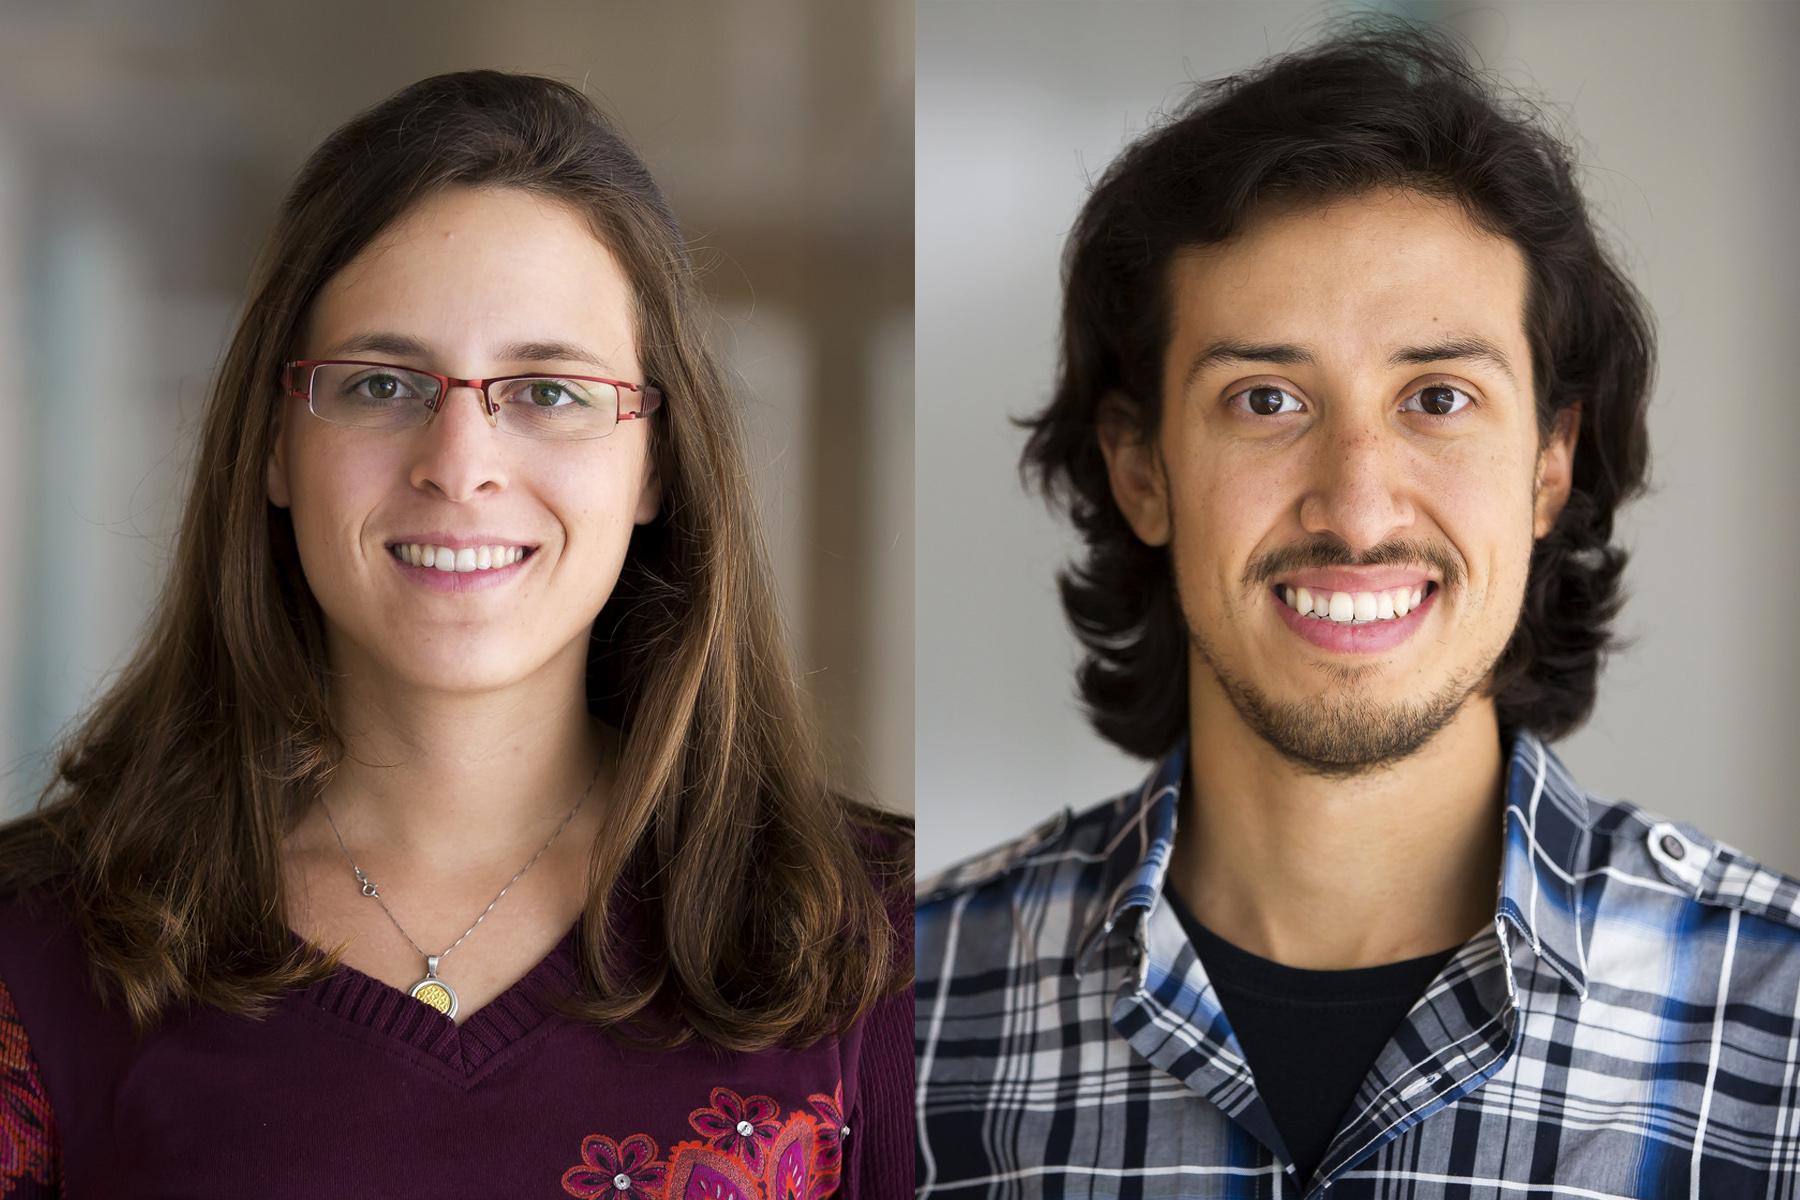 CSE Researchers Danai Koutra and Walter Lasecki